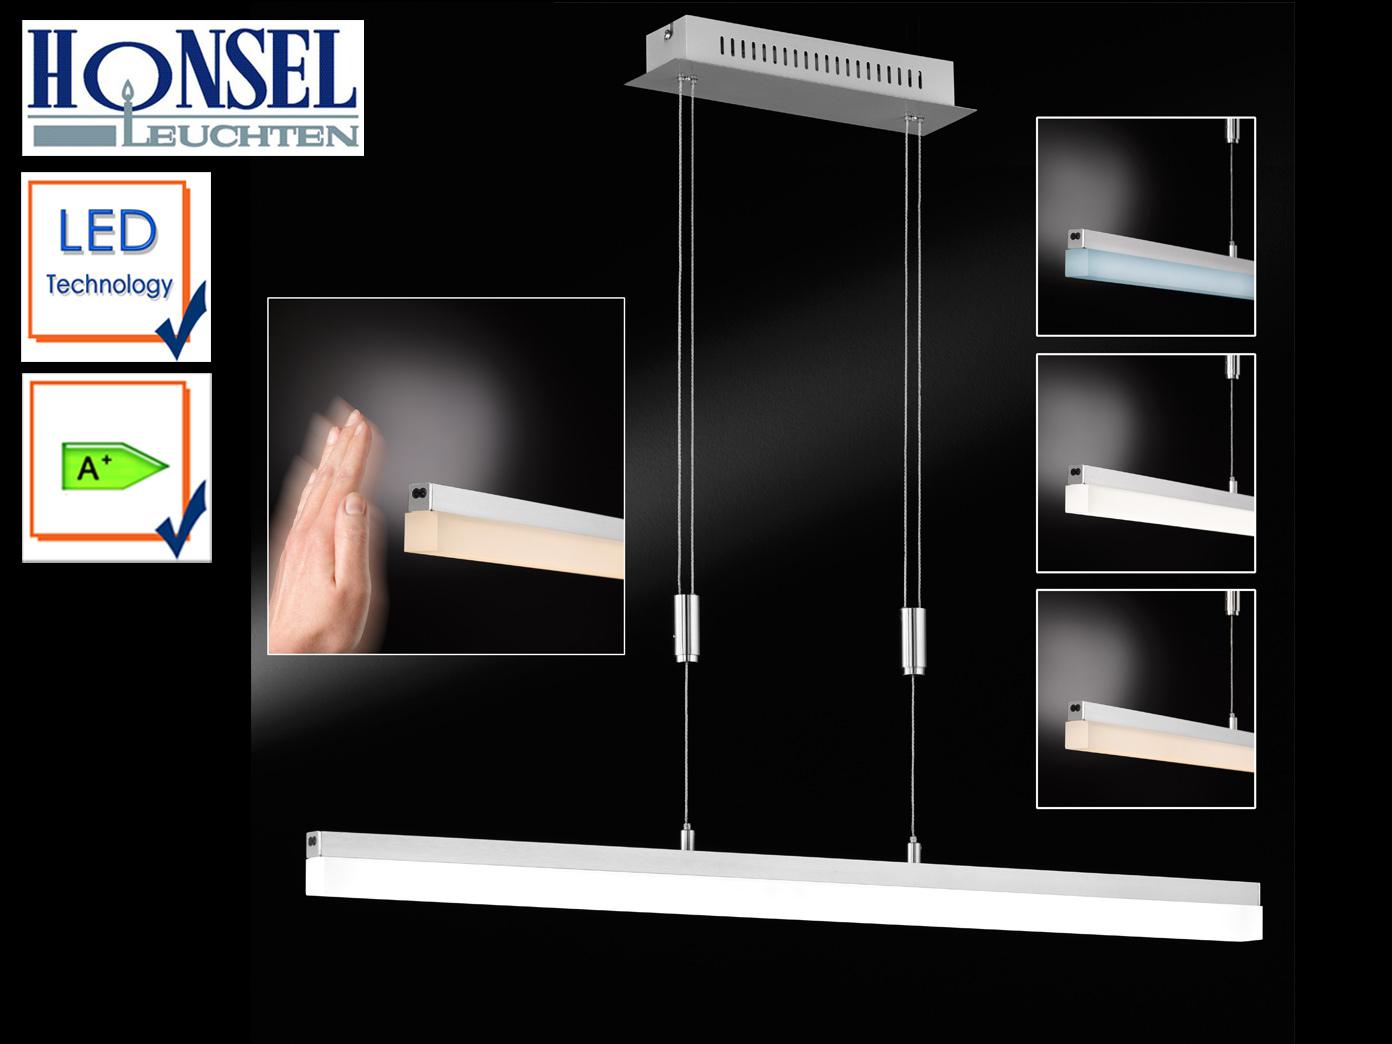 led pendelleuchte nickel matt l 90 cm dimmbar gestensteuerung design lampen ebay. Black Bedroom Furniture Sets. Home Design Ideas